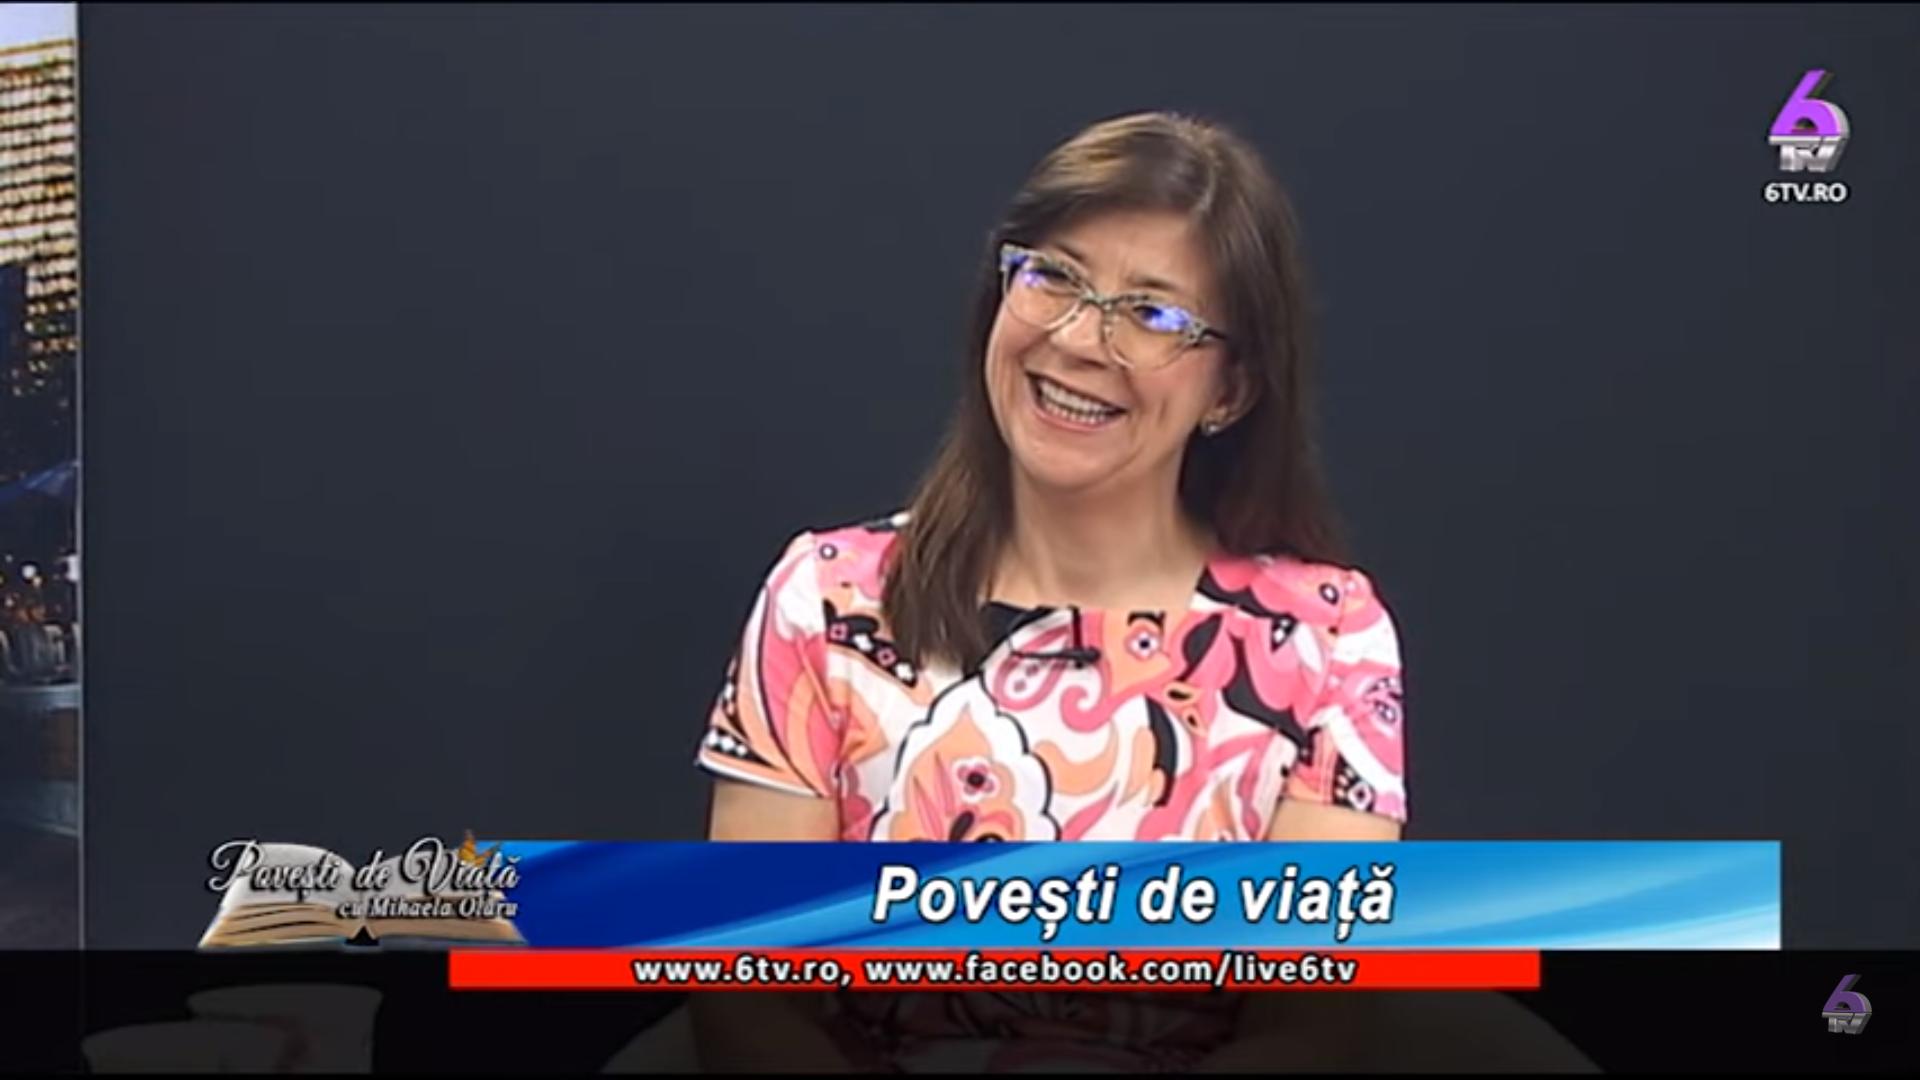 22. Prof univ. Dr. Andreea Chiș - Judecător și Membru CSM